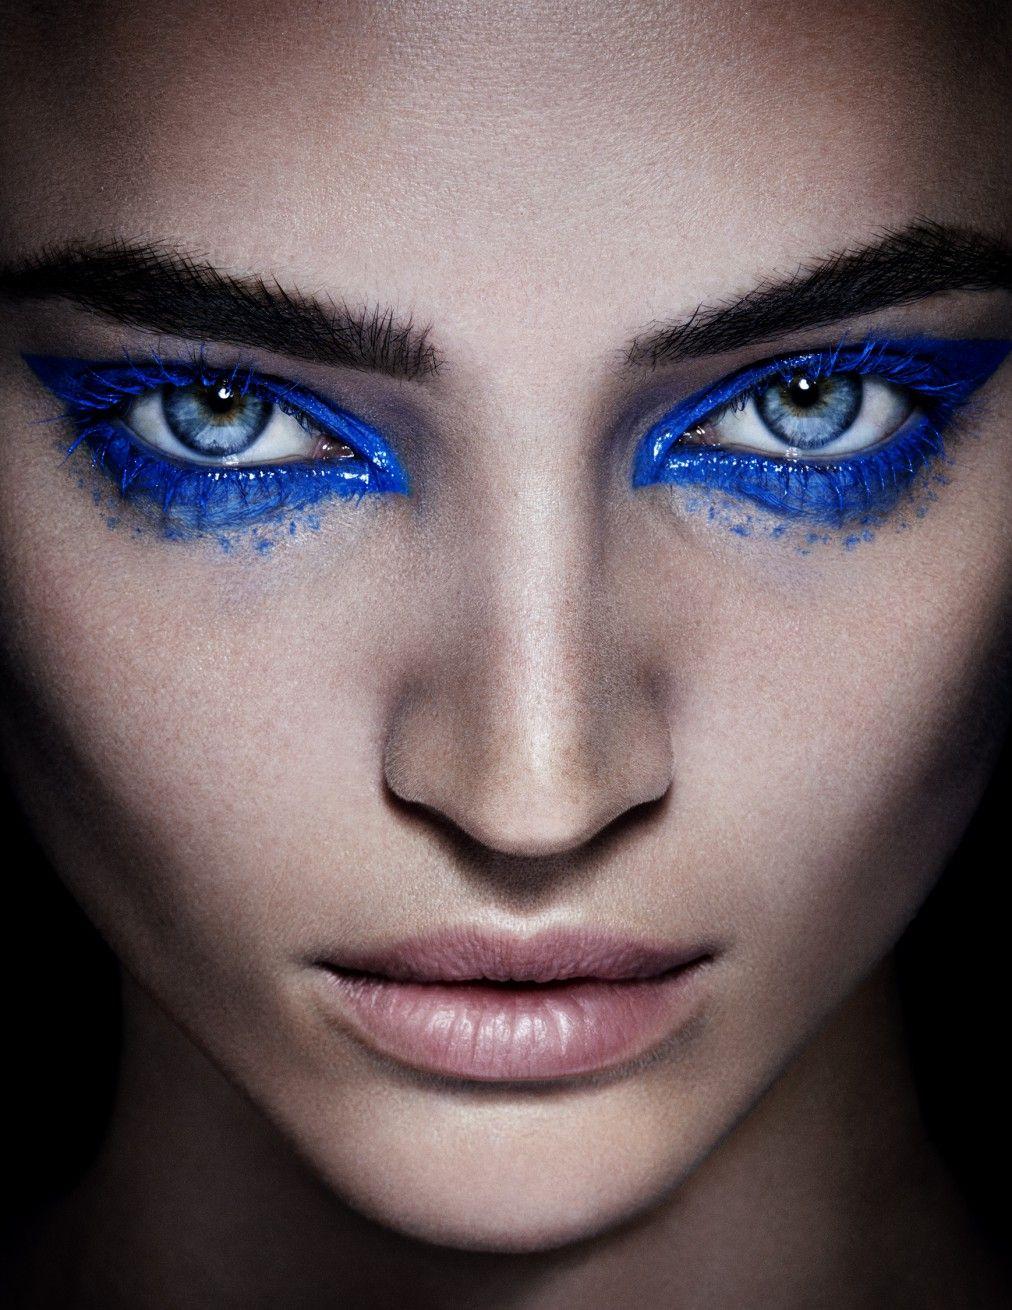 Blue Makeup: Carolina Dali (The Wall Group